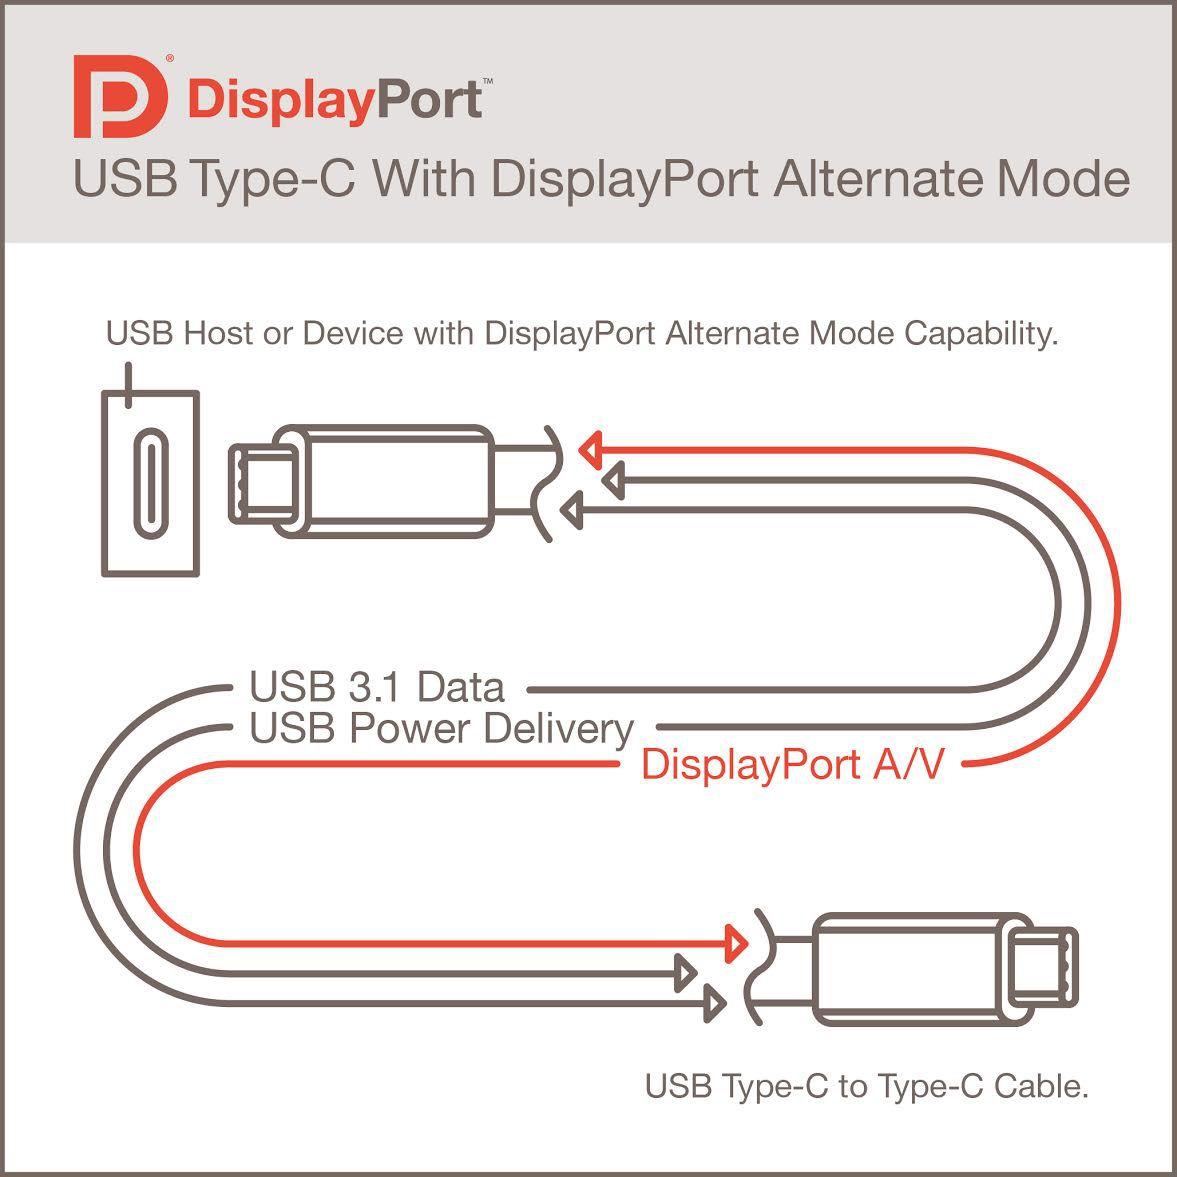 DisplayPort Alternate Mode